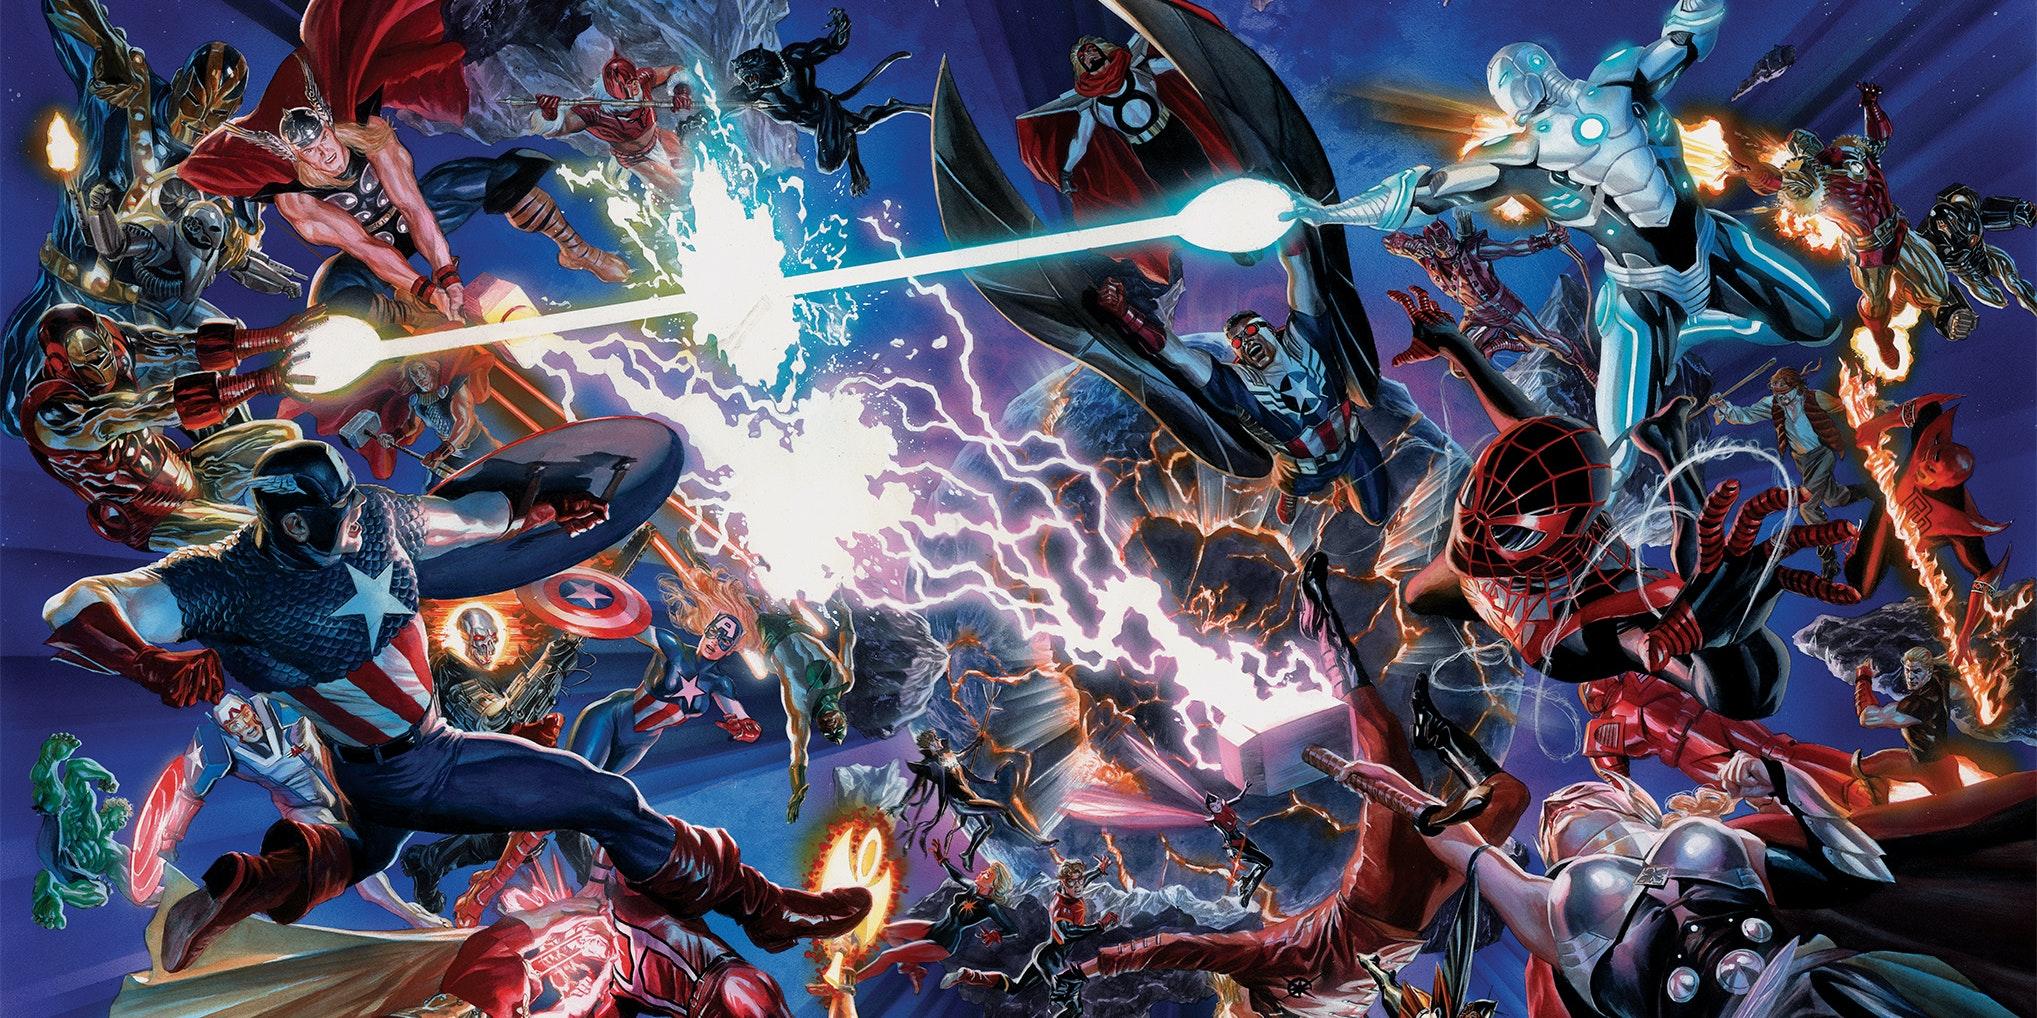 A Guide to Binging Digital Comics